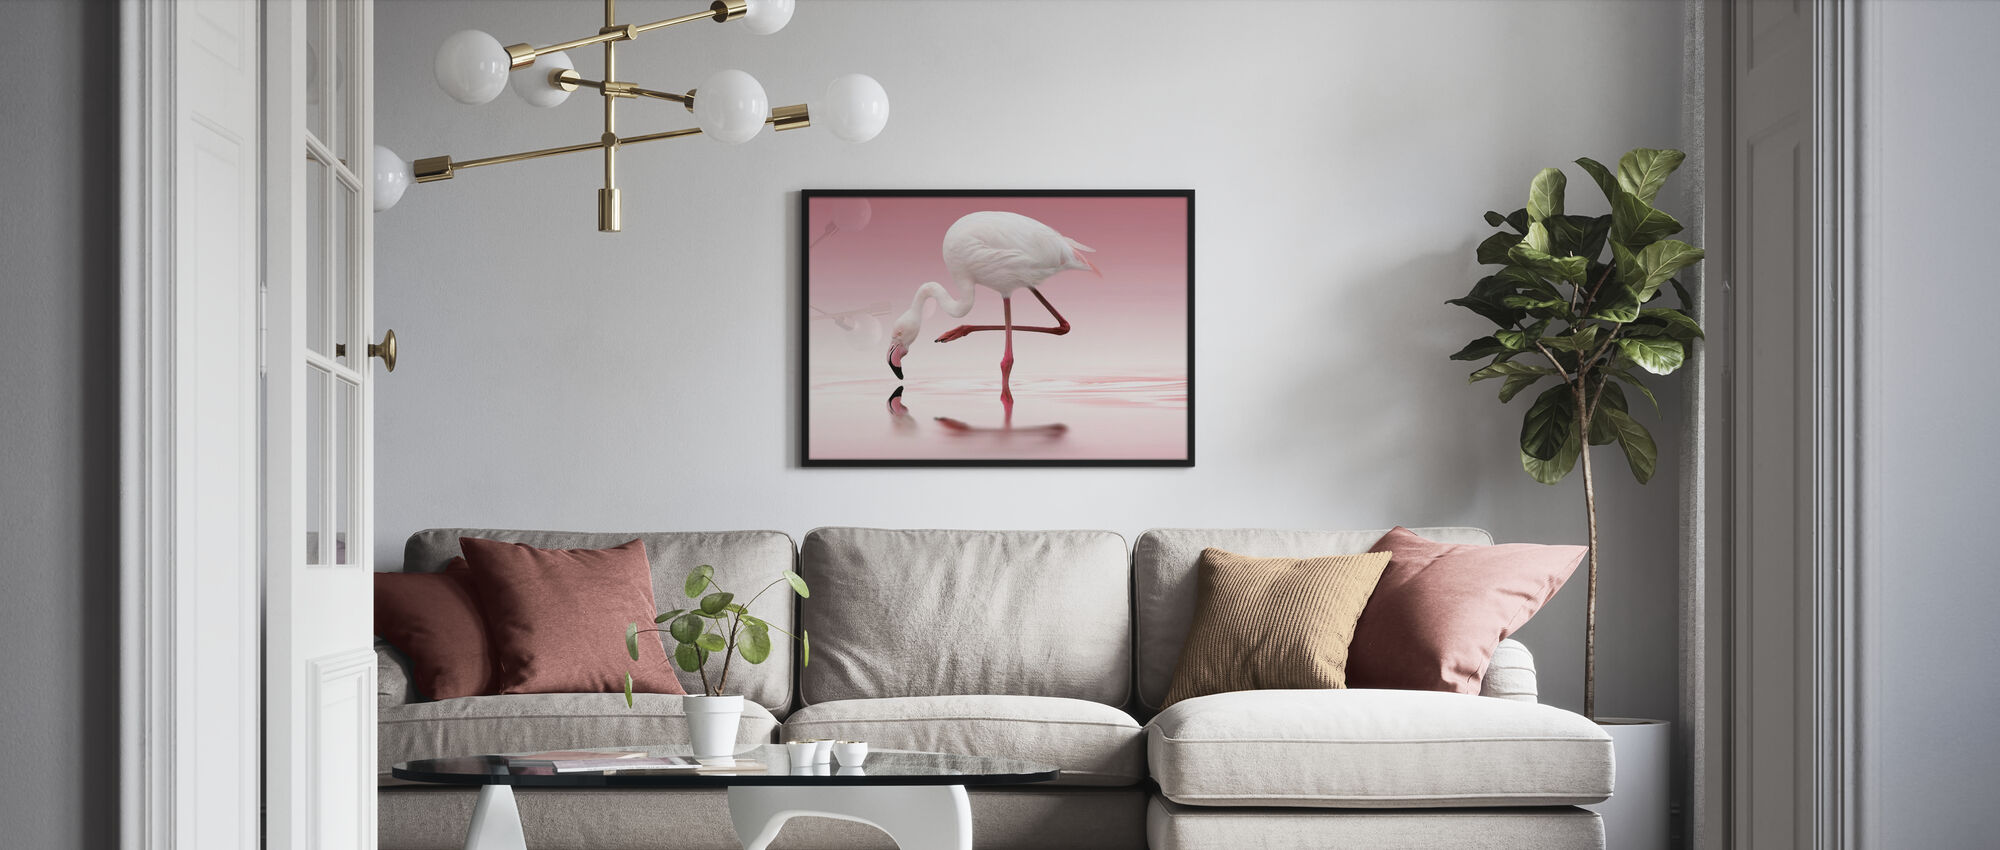 Pink Flamingo - Poster - Living Room